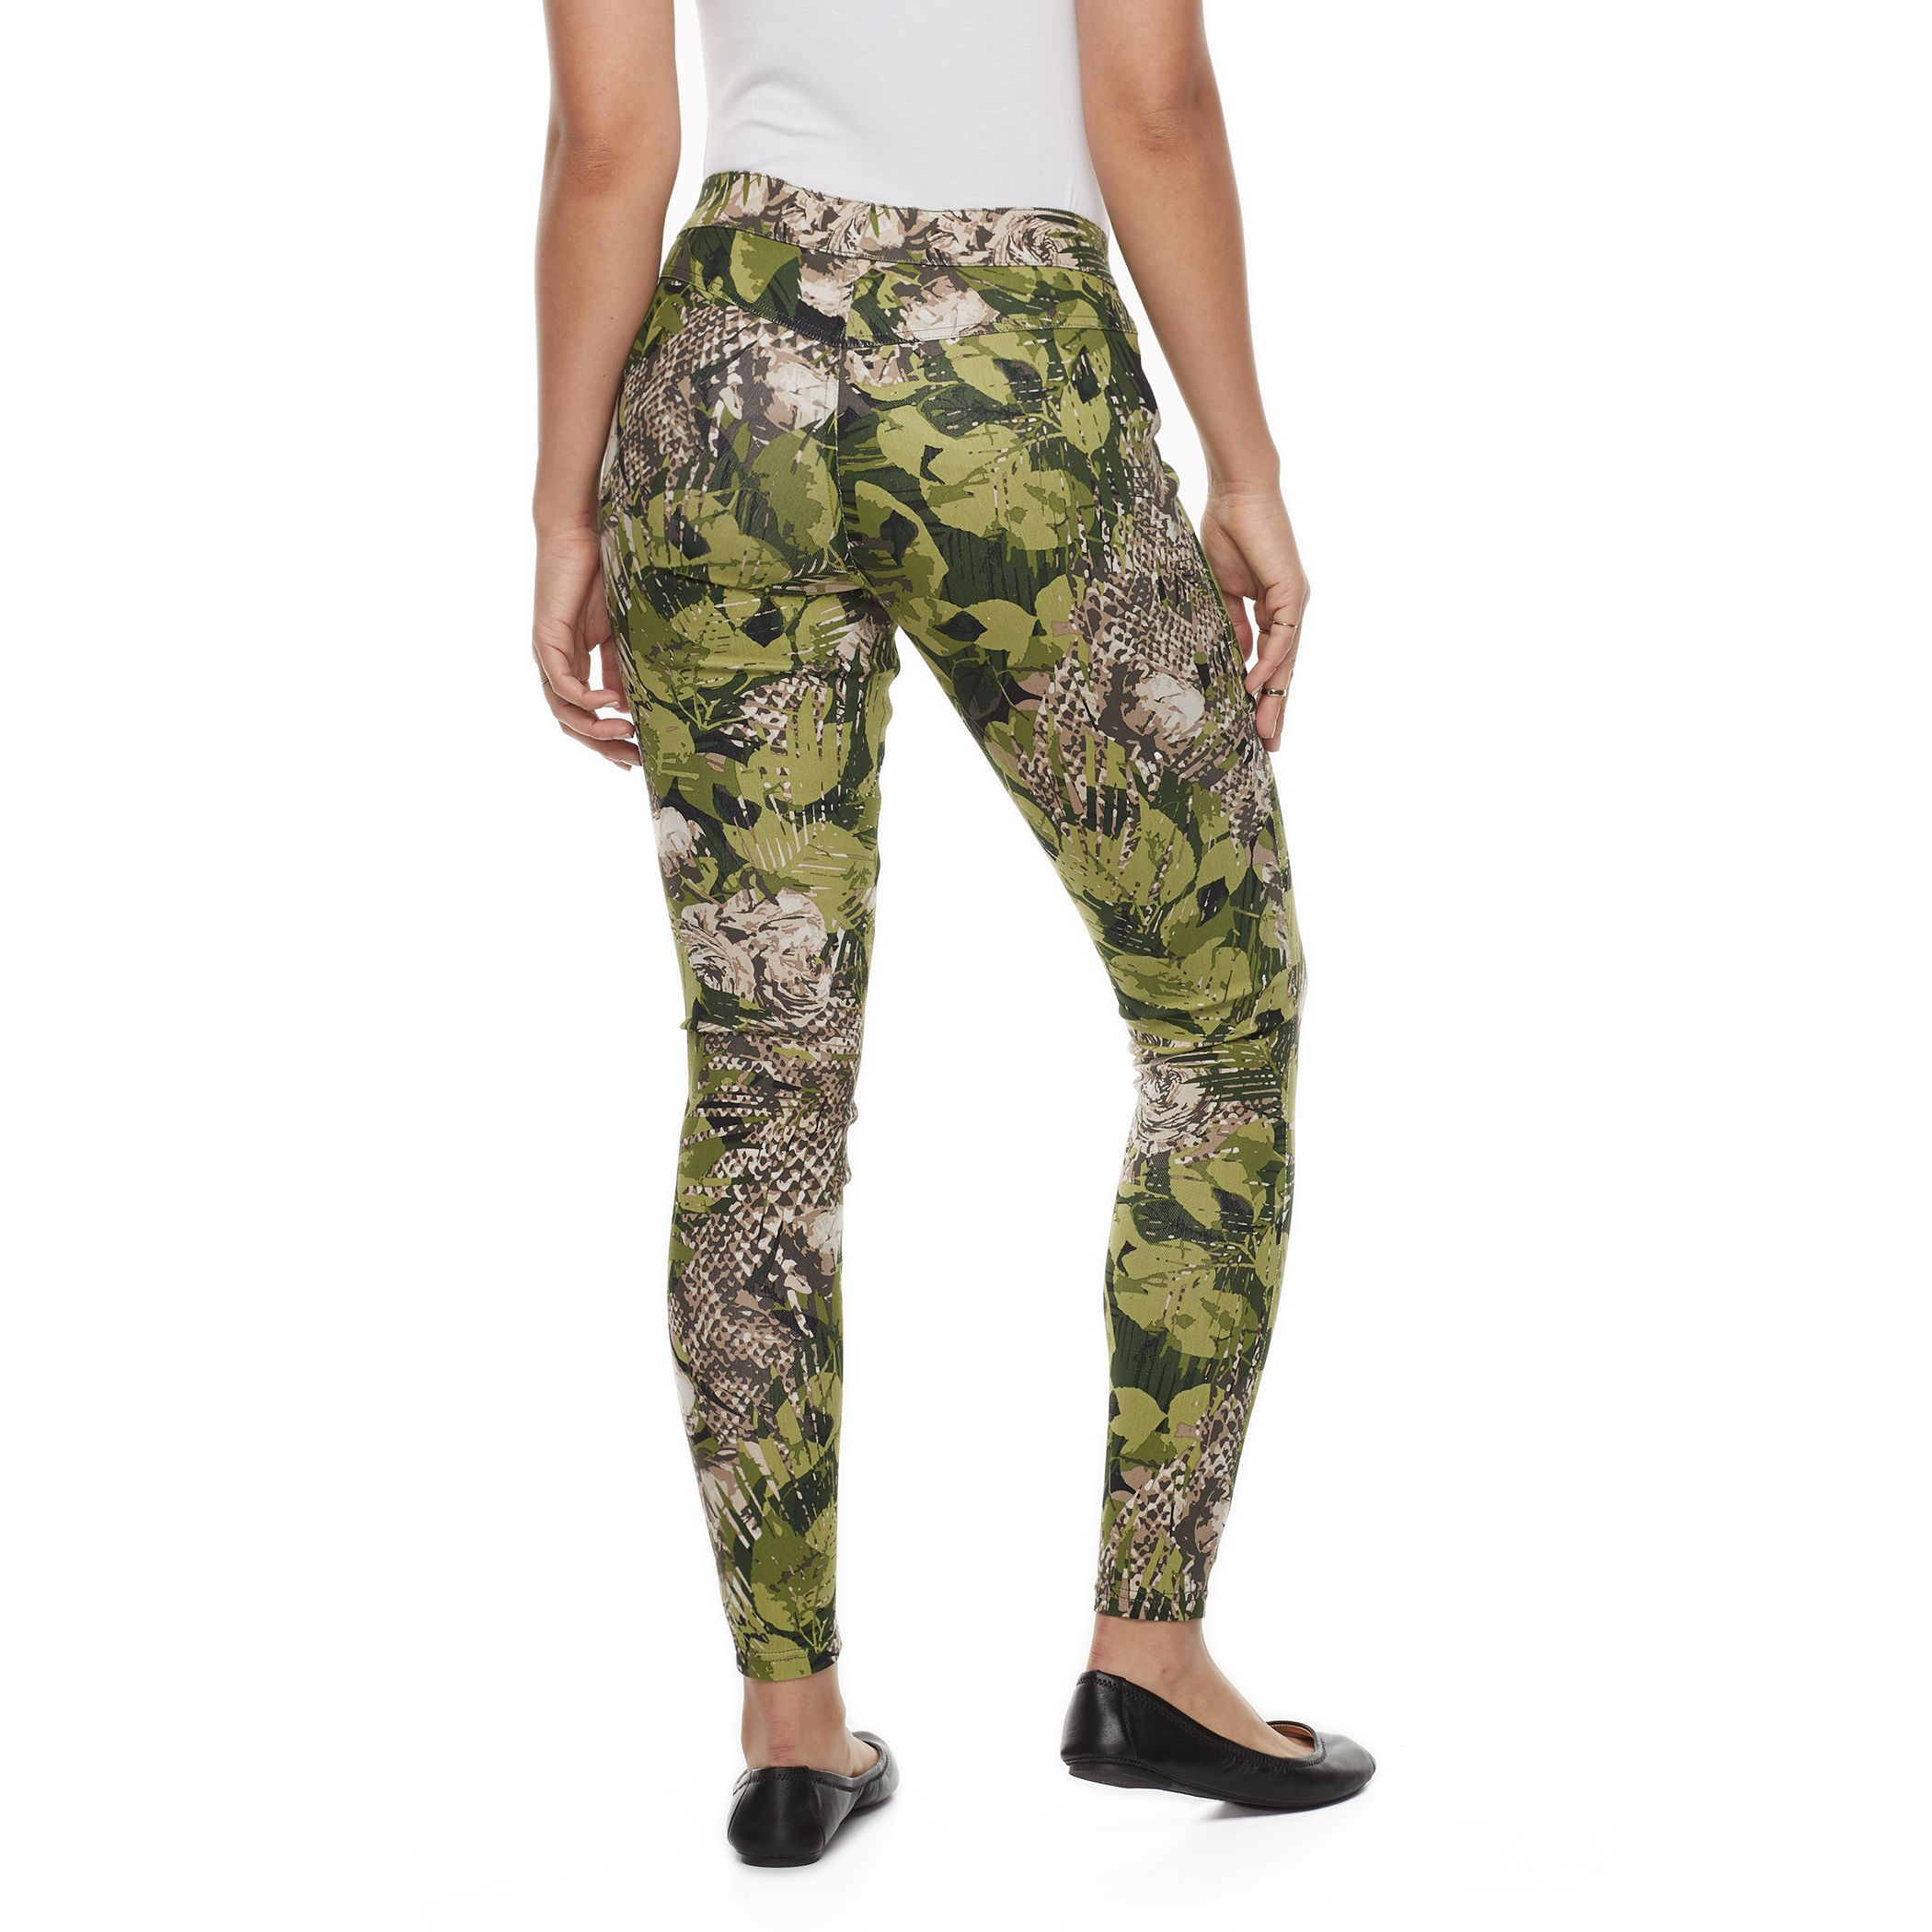 f76688bad51f6c Womens Utopia by HUE Leggings Bottoms, Clothing | Kohl's